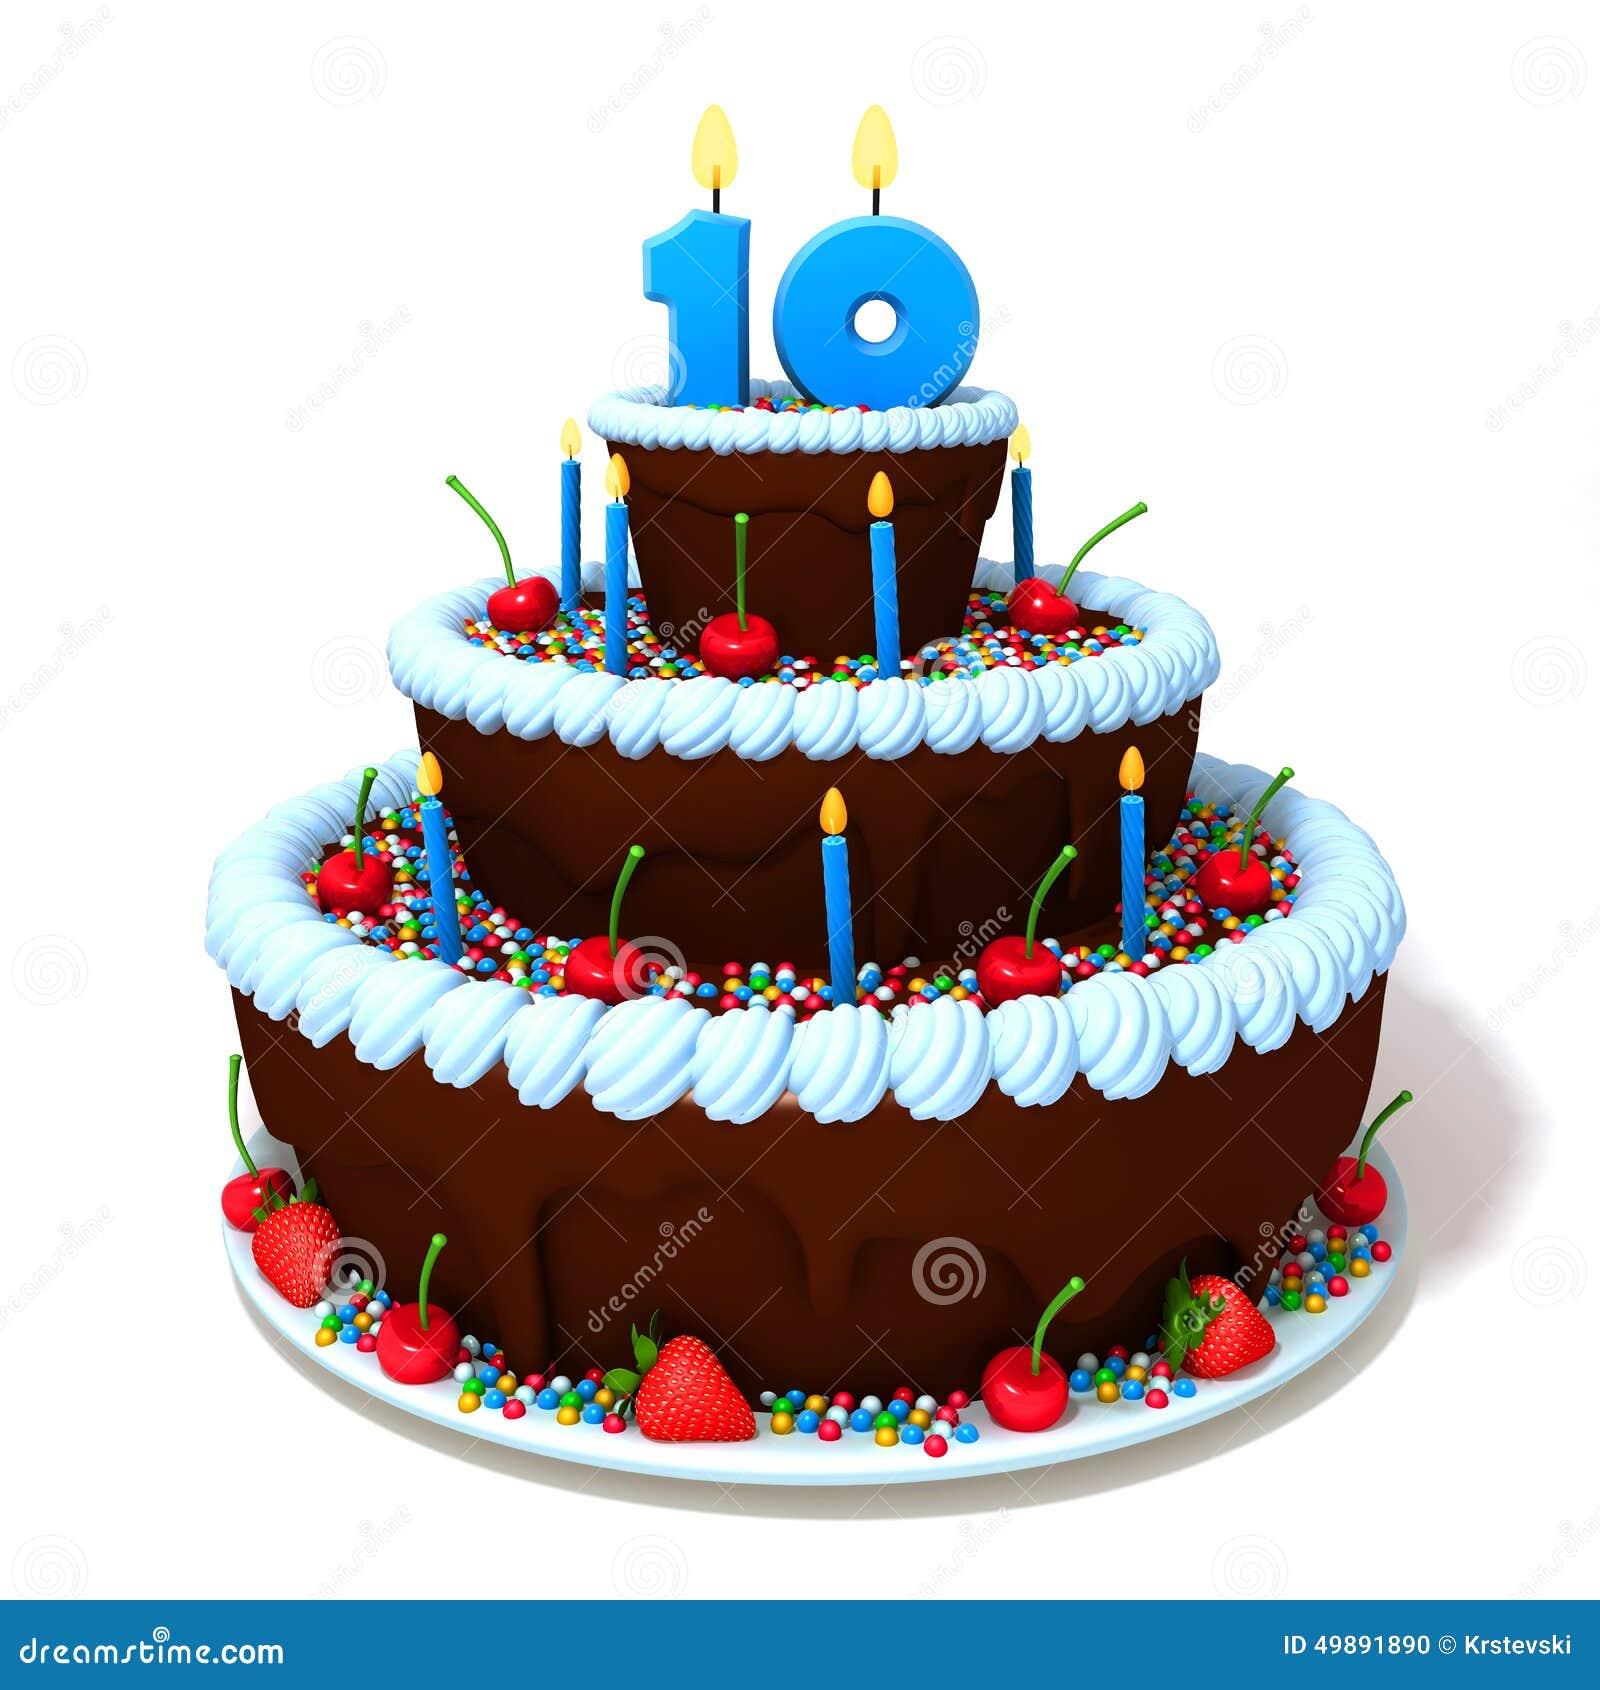 Sugar Free Baby Birthday Cake